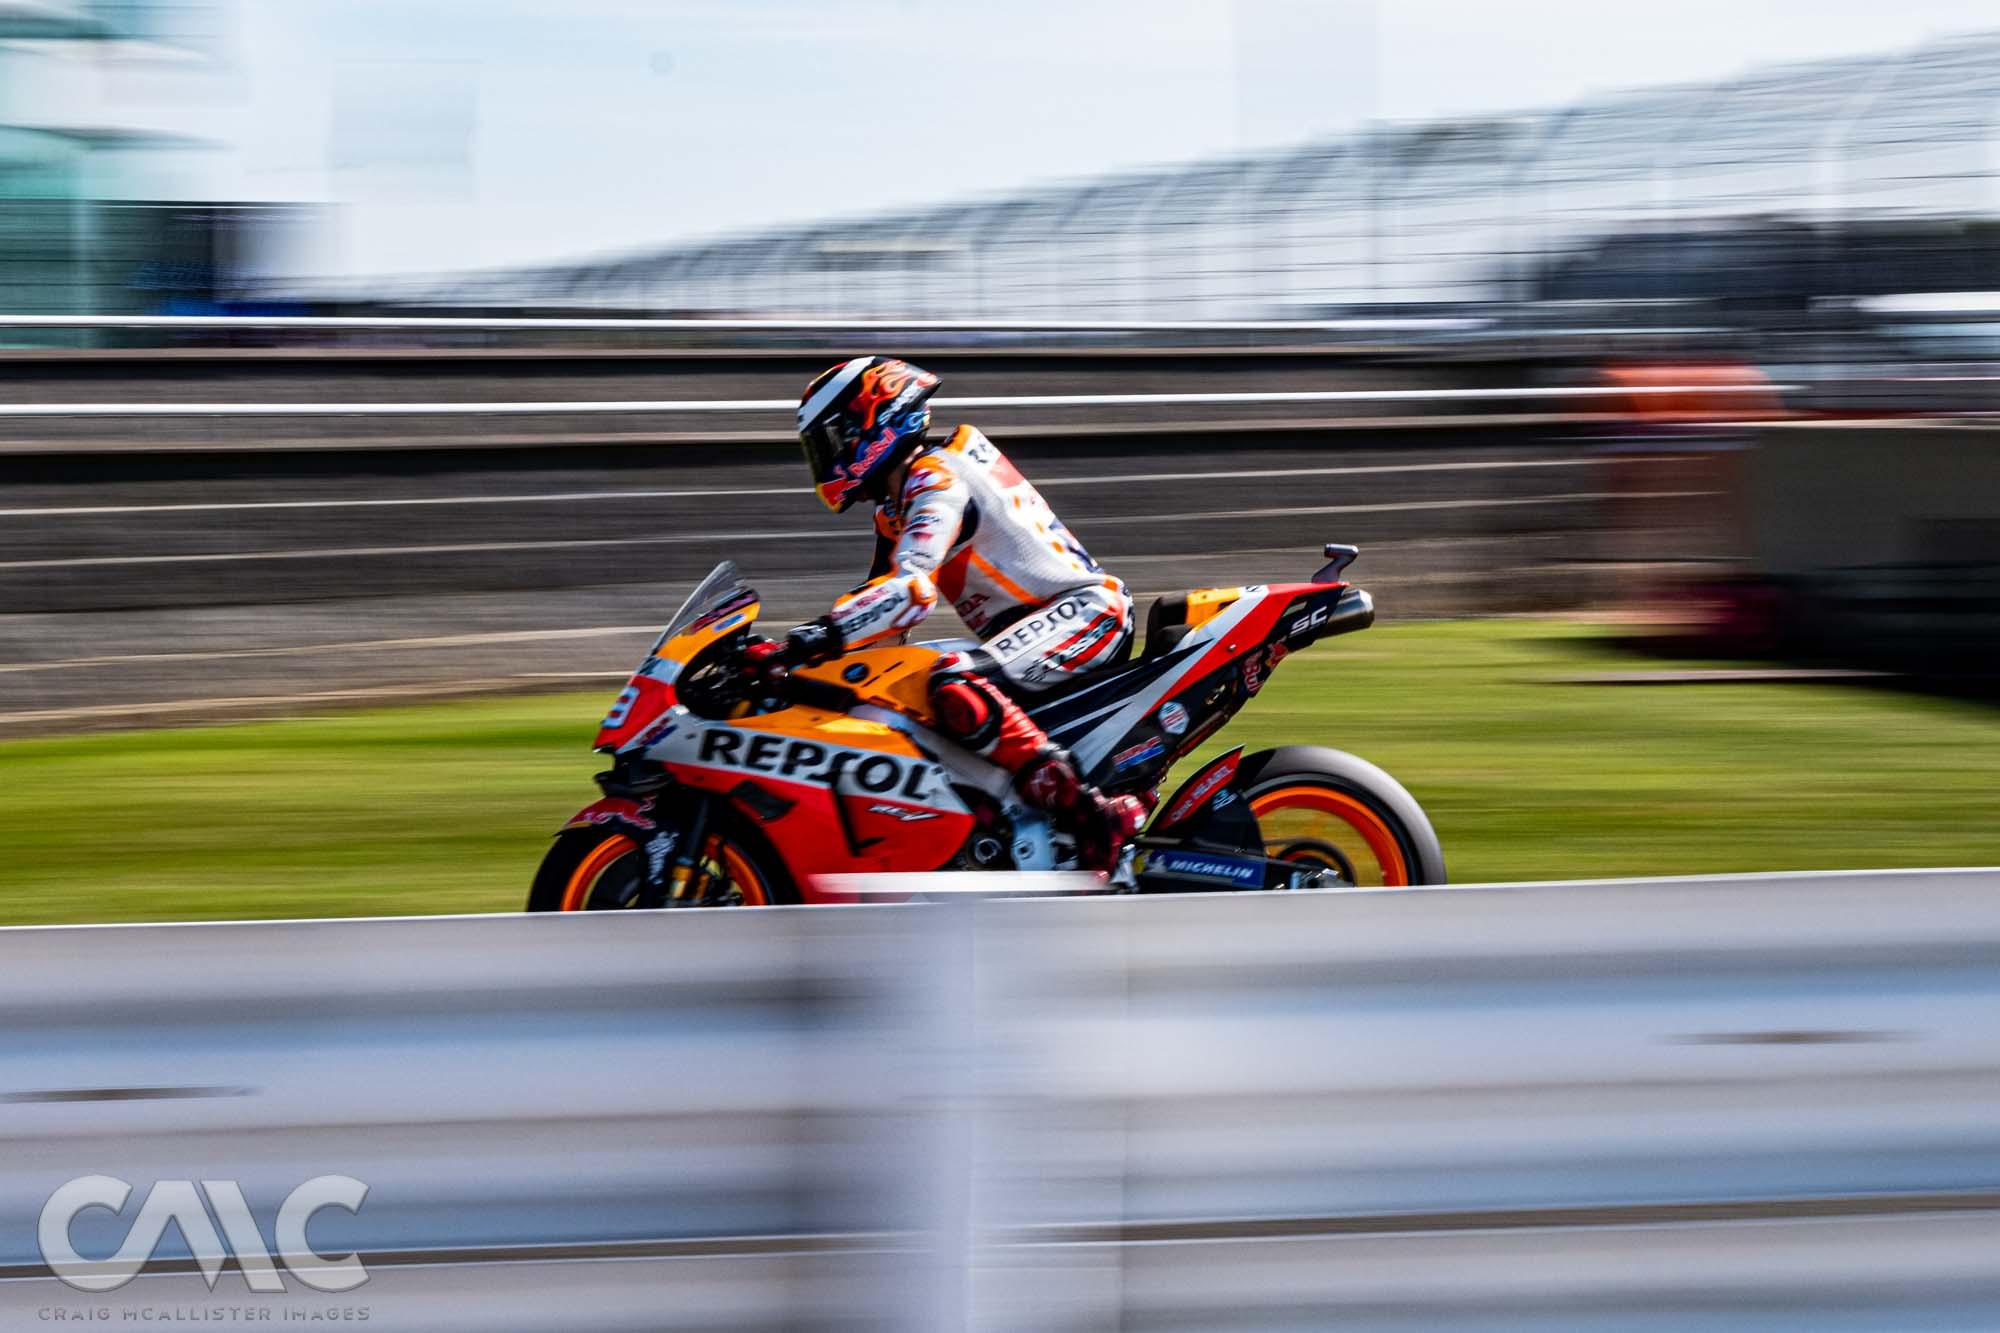 CMC_MotoGP_Qualifying_Silverstone 50-1405244.jpg